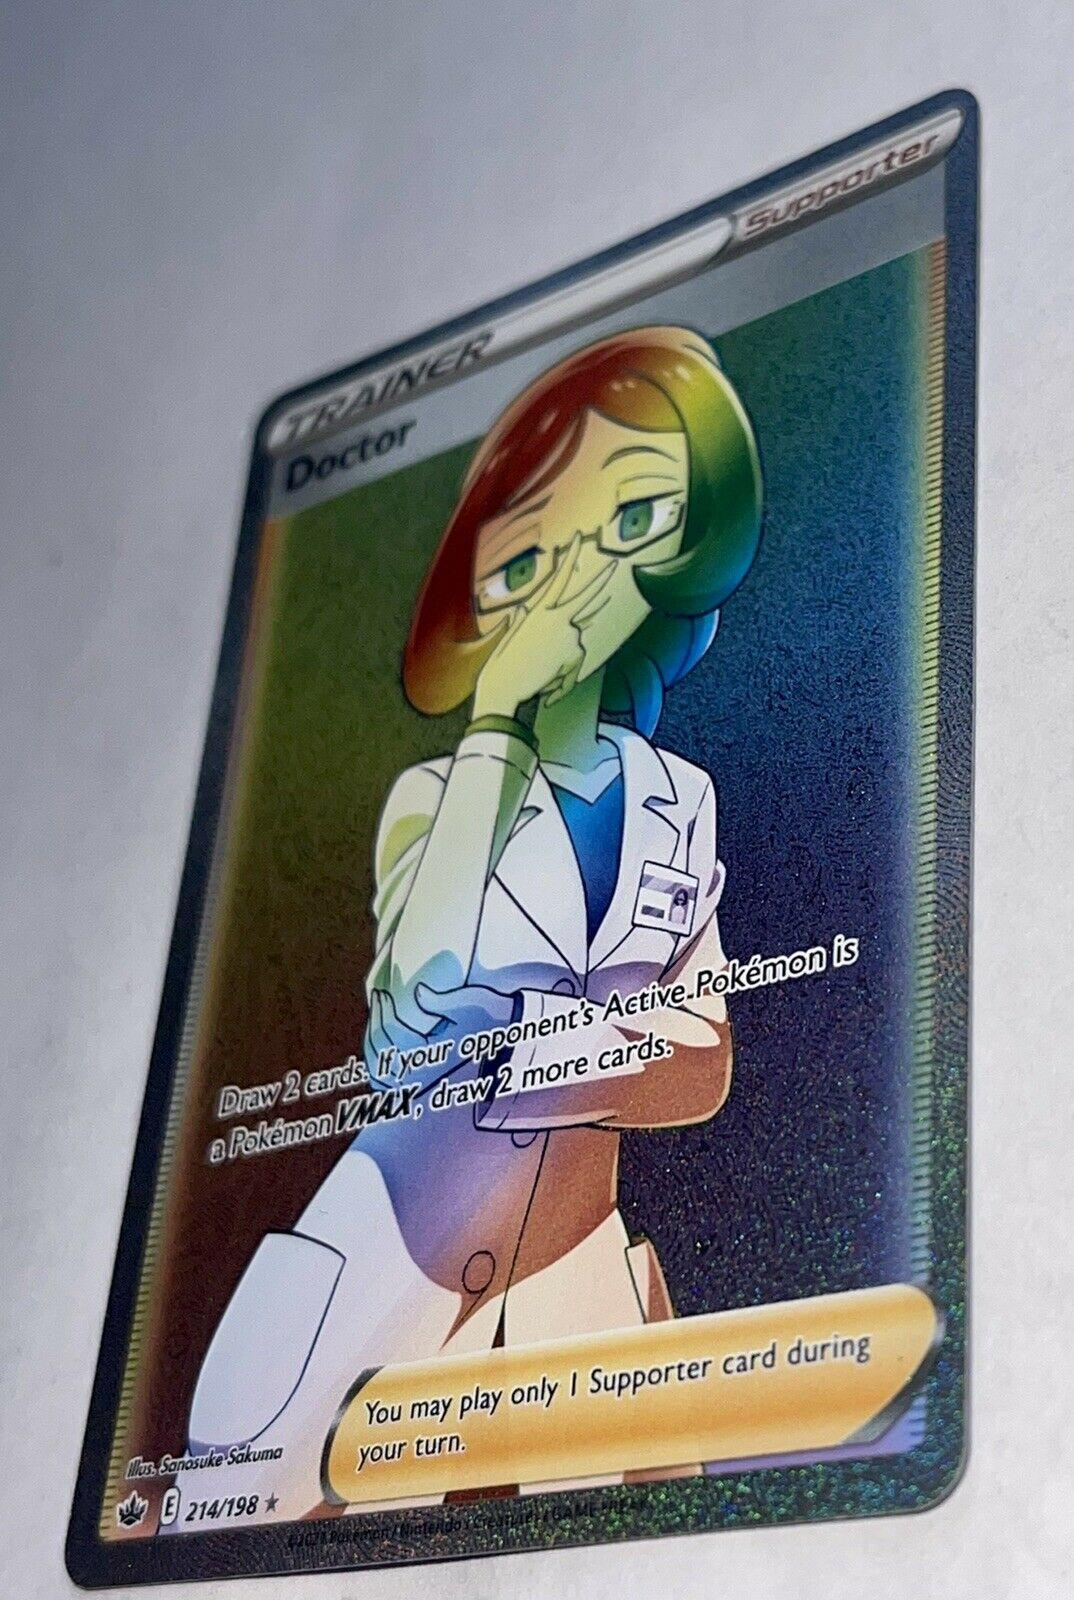 Doctor Rainbow Rare Pokémon Chilling Reign 214/198 - Image 2